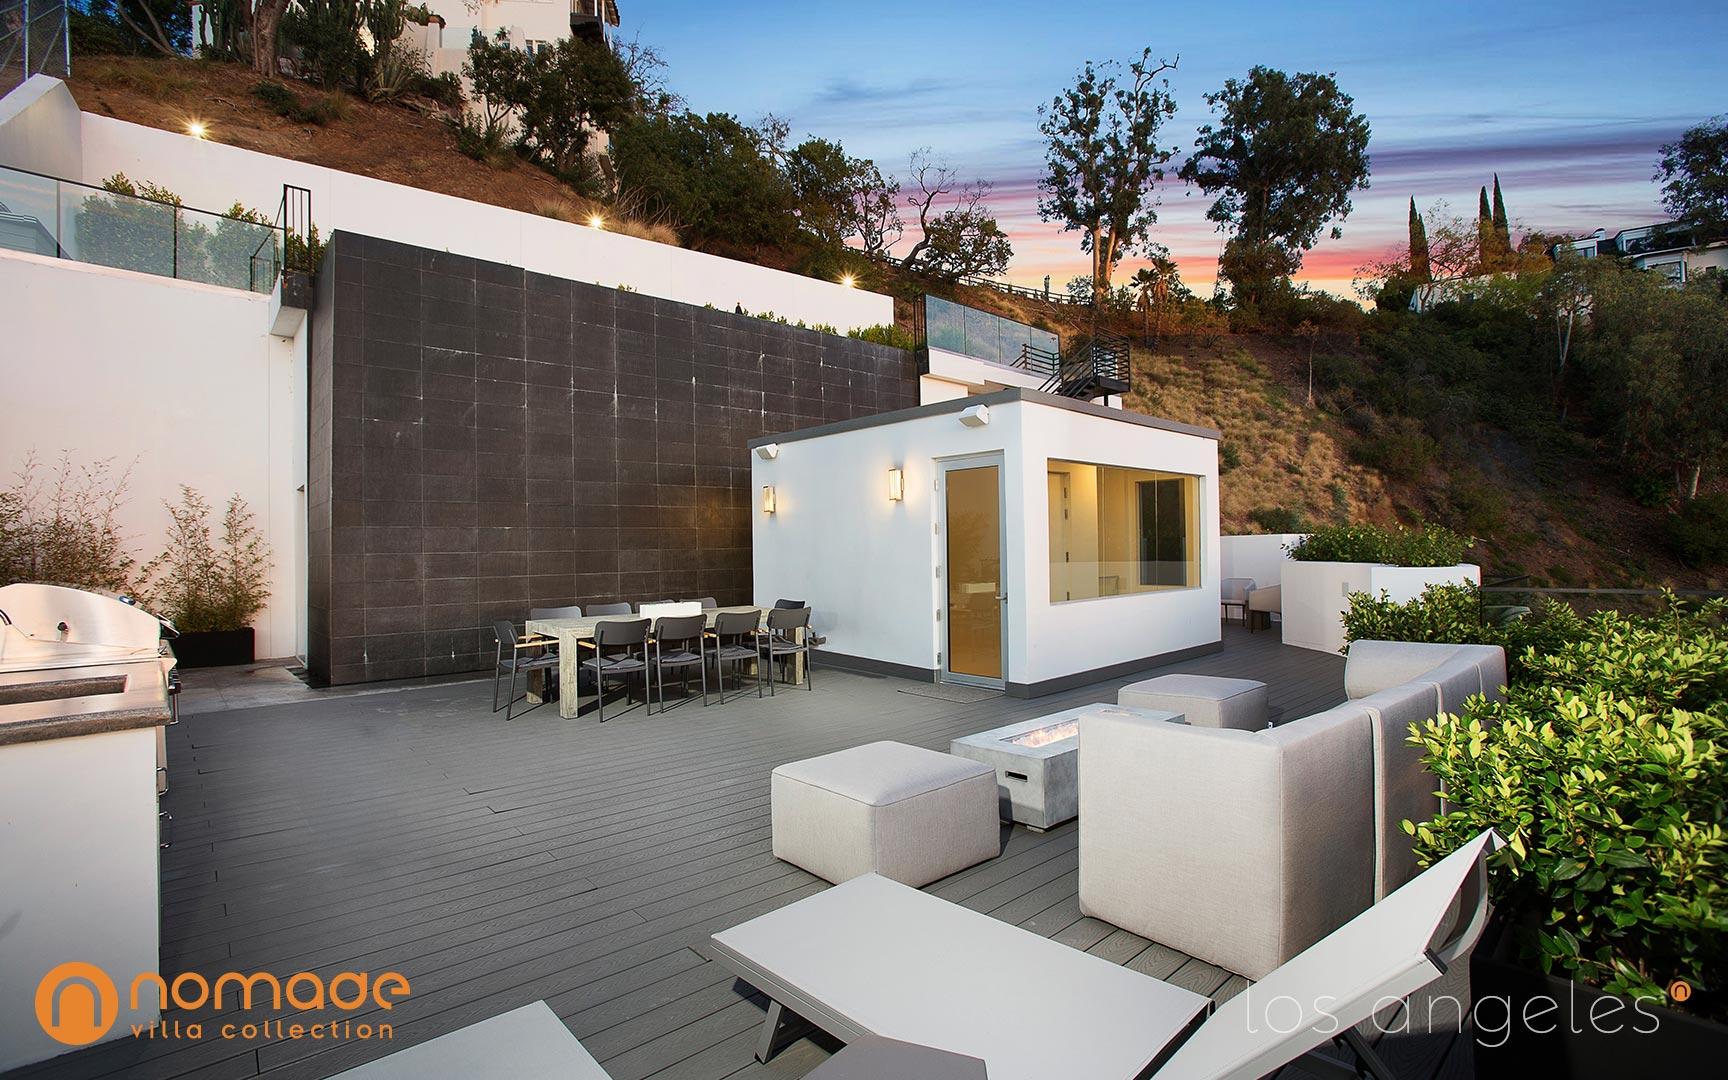 nomade-losangeles-BeverlyCrest-030